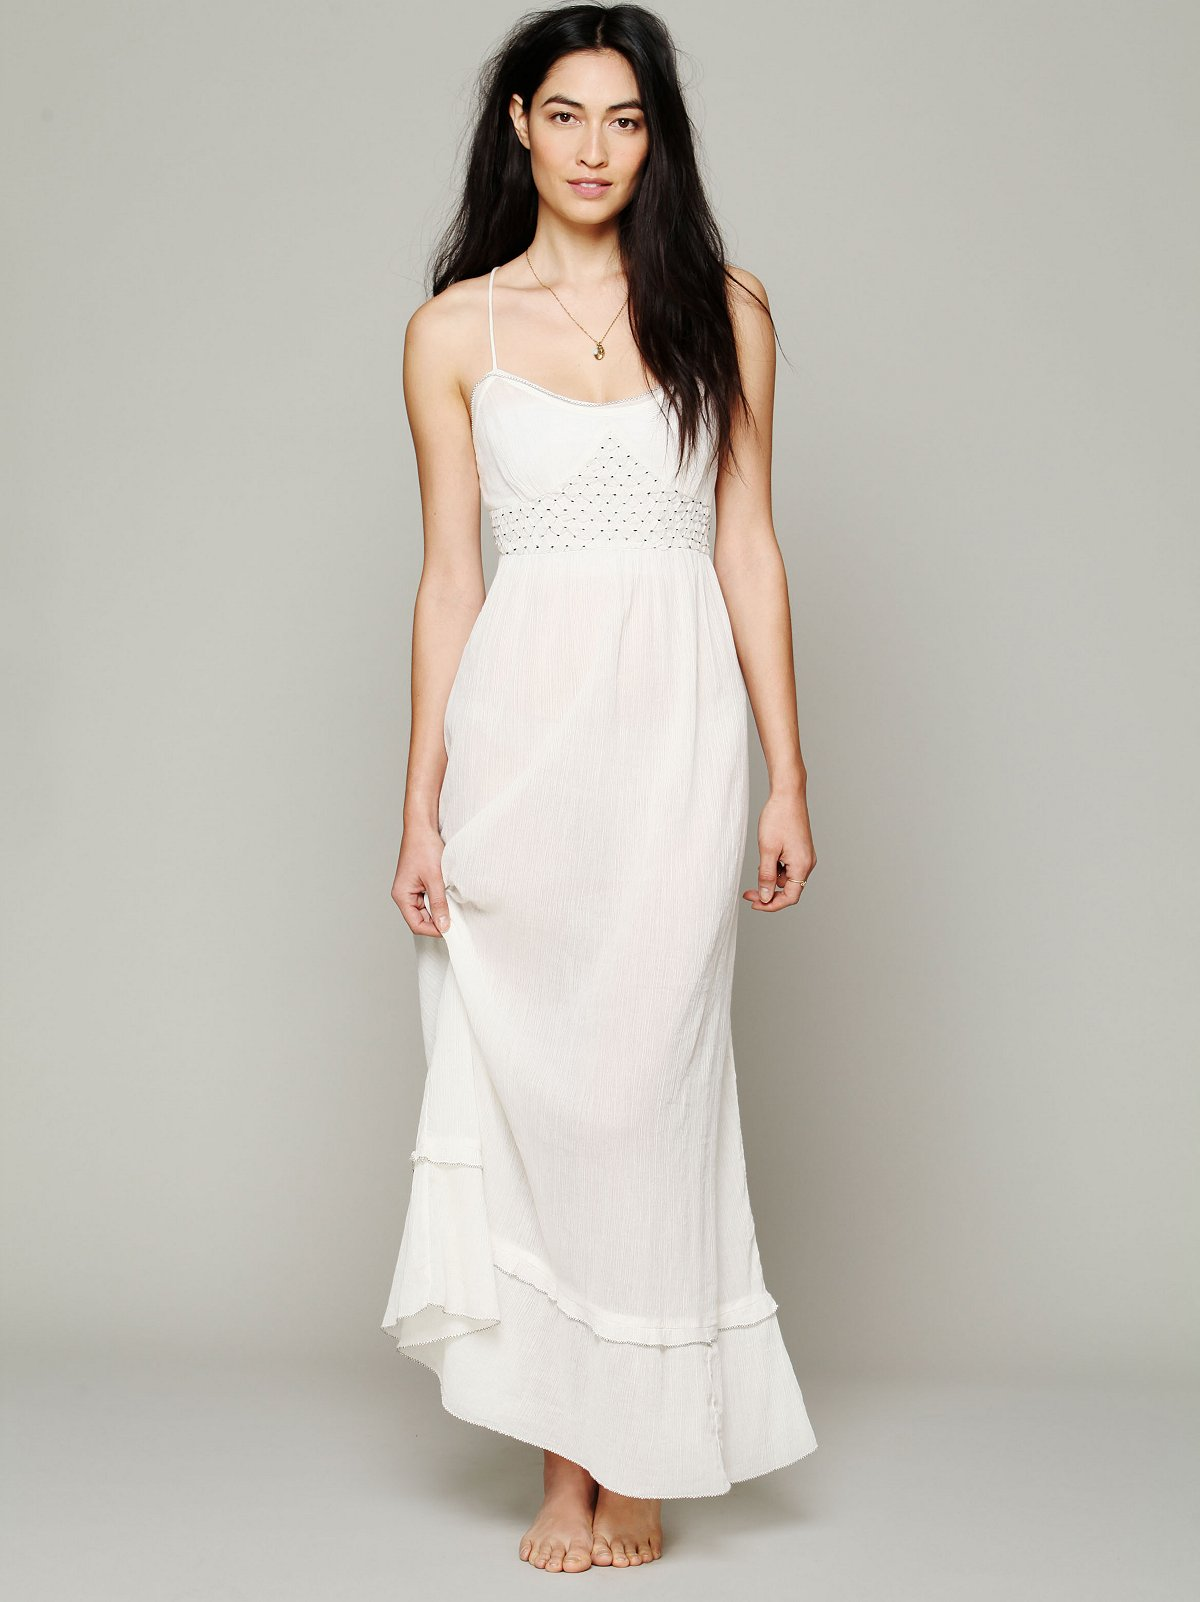 Smocked Gauze Sleep Dress